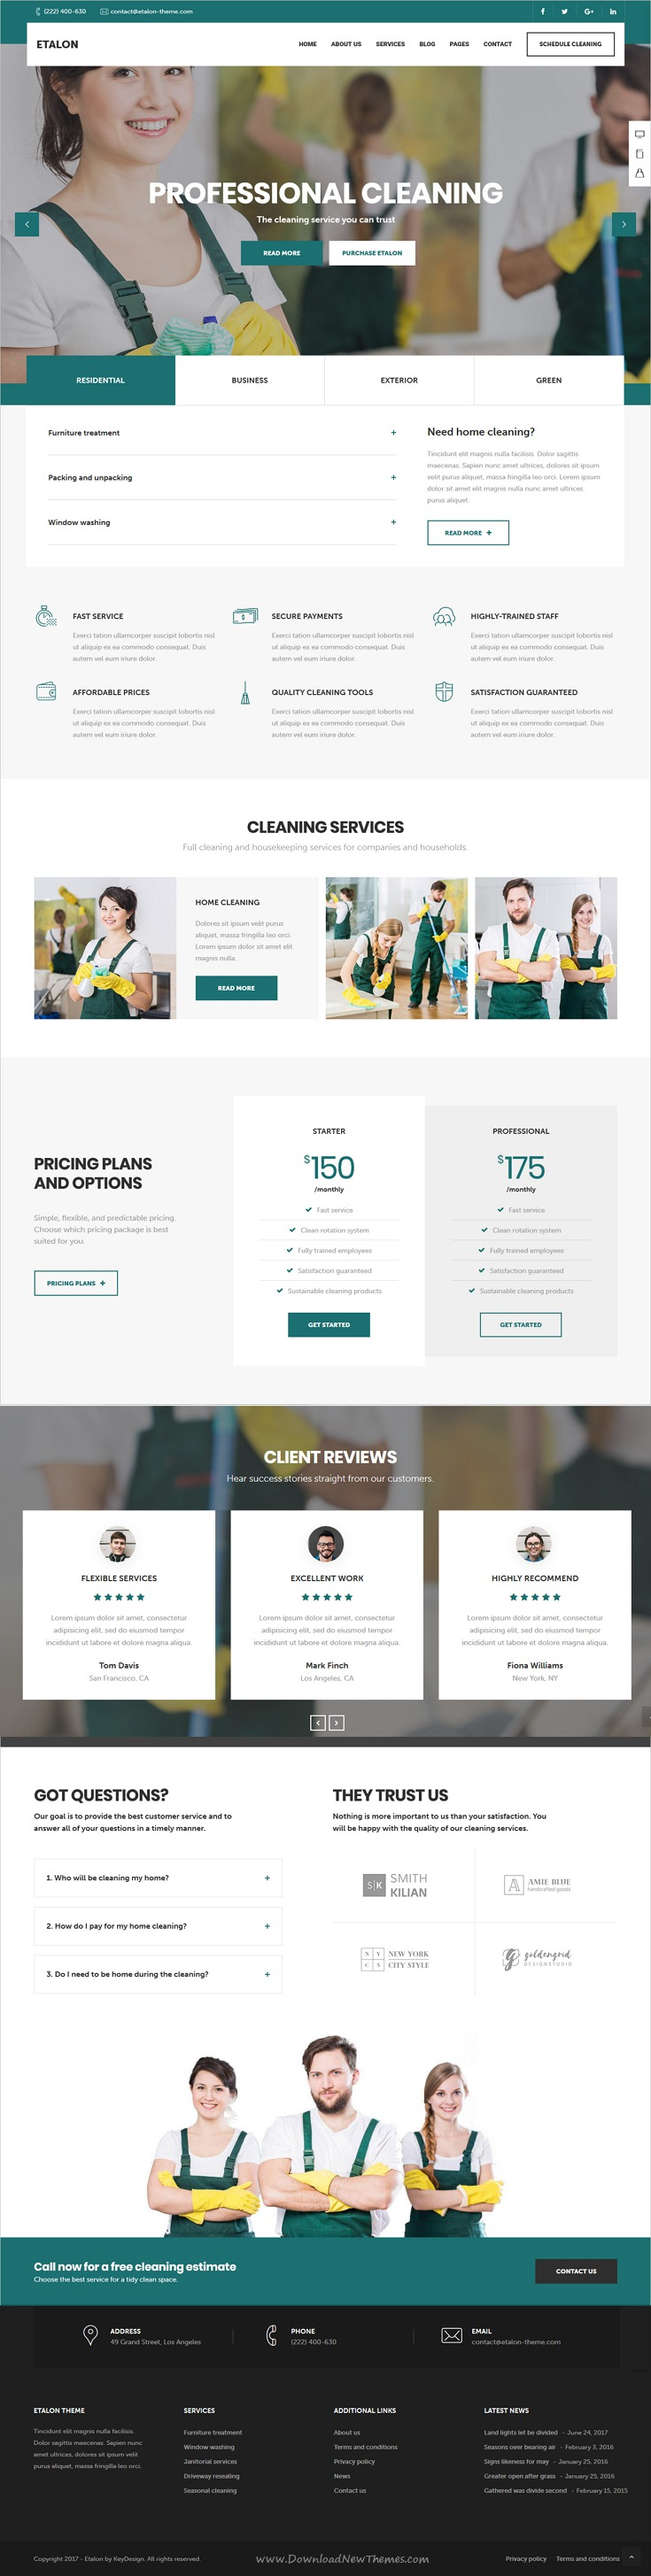 Etalon Multi Concept Theme For Professional Services Wordpress Theme Free Responsive Layout Download User Interface Design